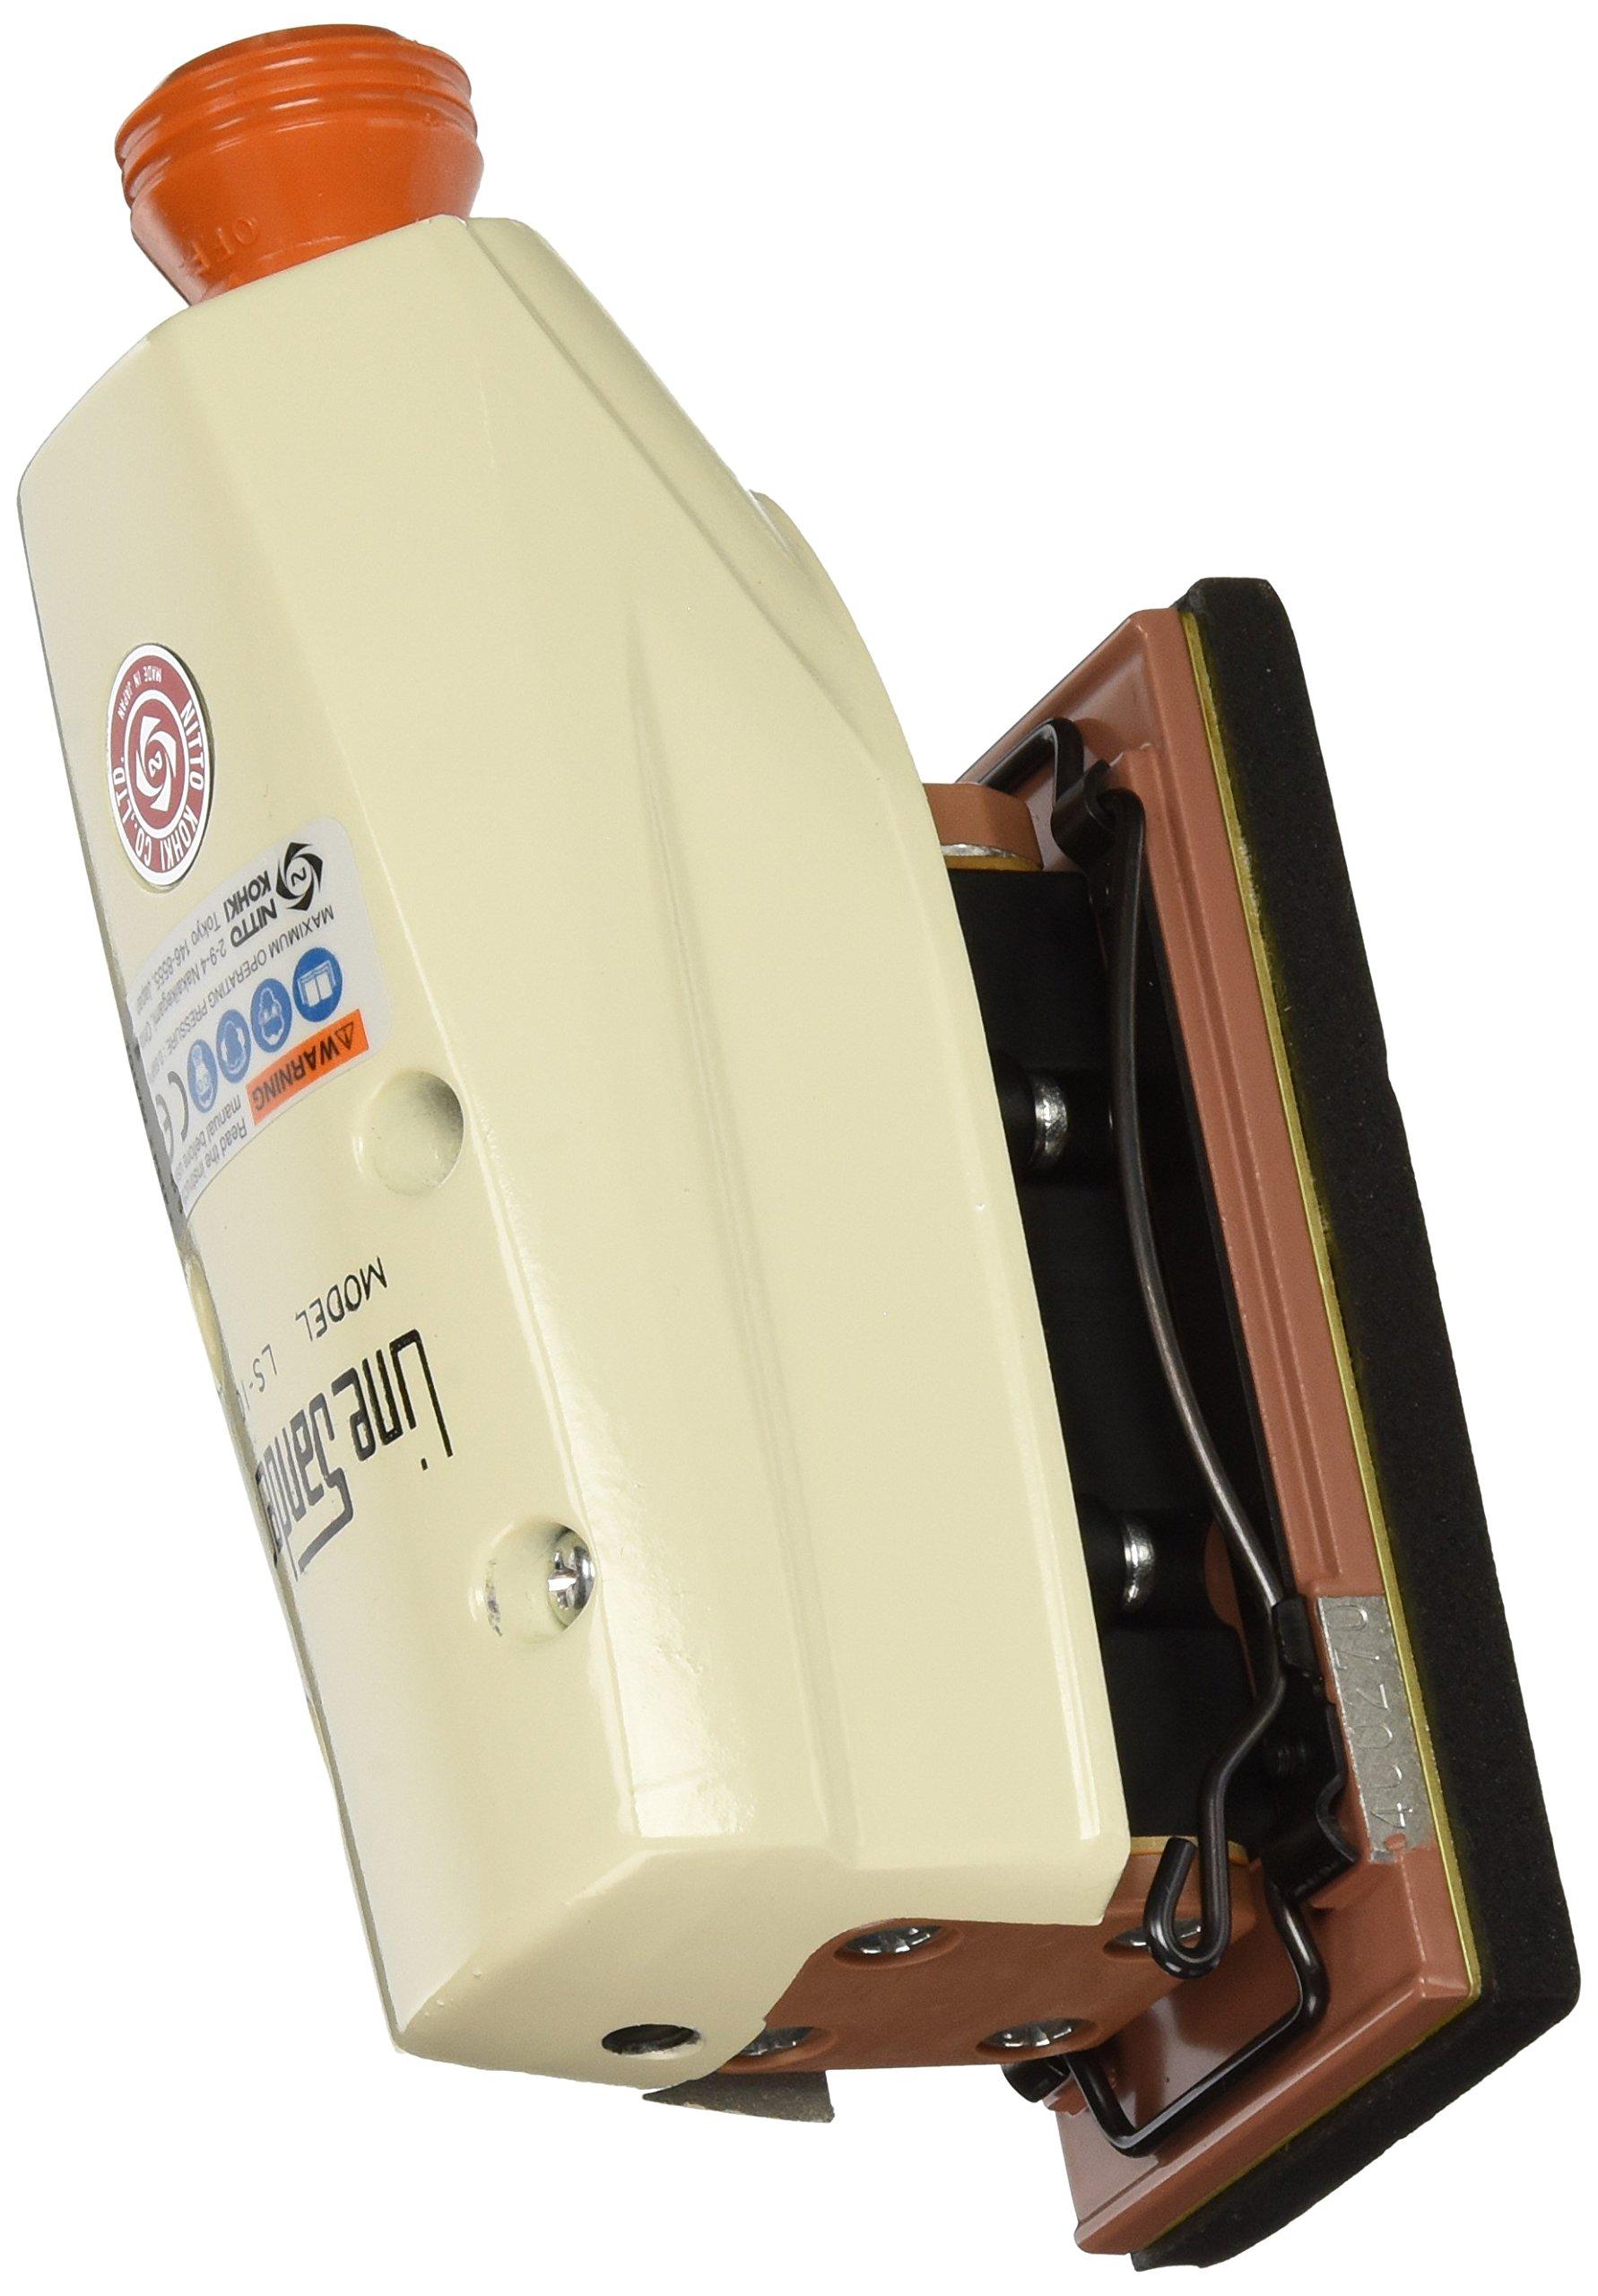 Nitto Kohki LS-10 Line Sander, 85 PSI, 4,000 SPM, 5/32'' Stoke, 2-5/32'' x 4-1/16'' Pad, 2-1/4'' x 5-1/2'' Paper Size